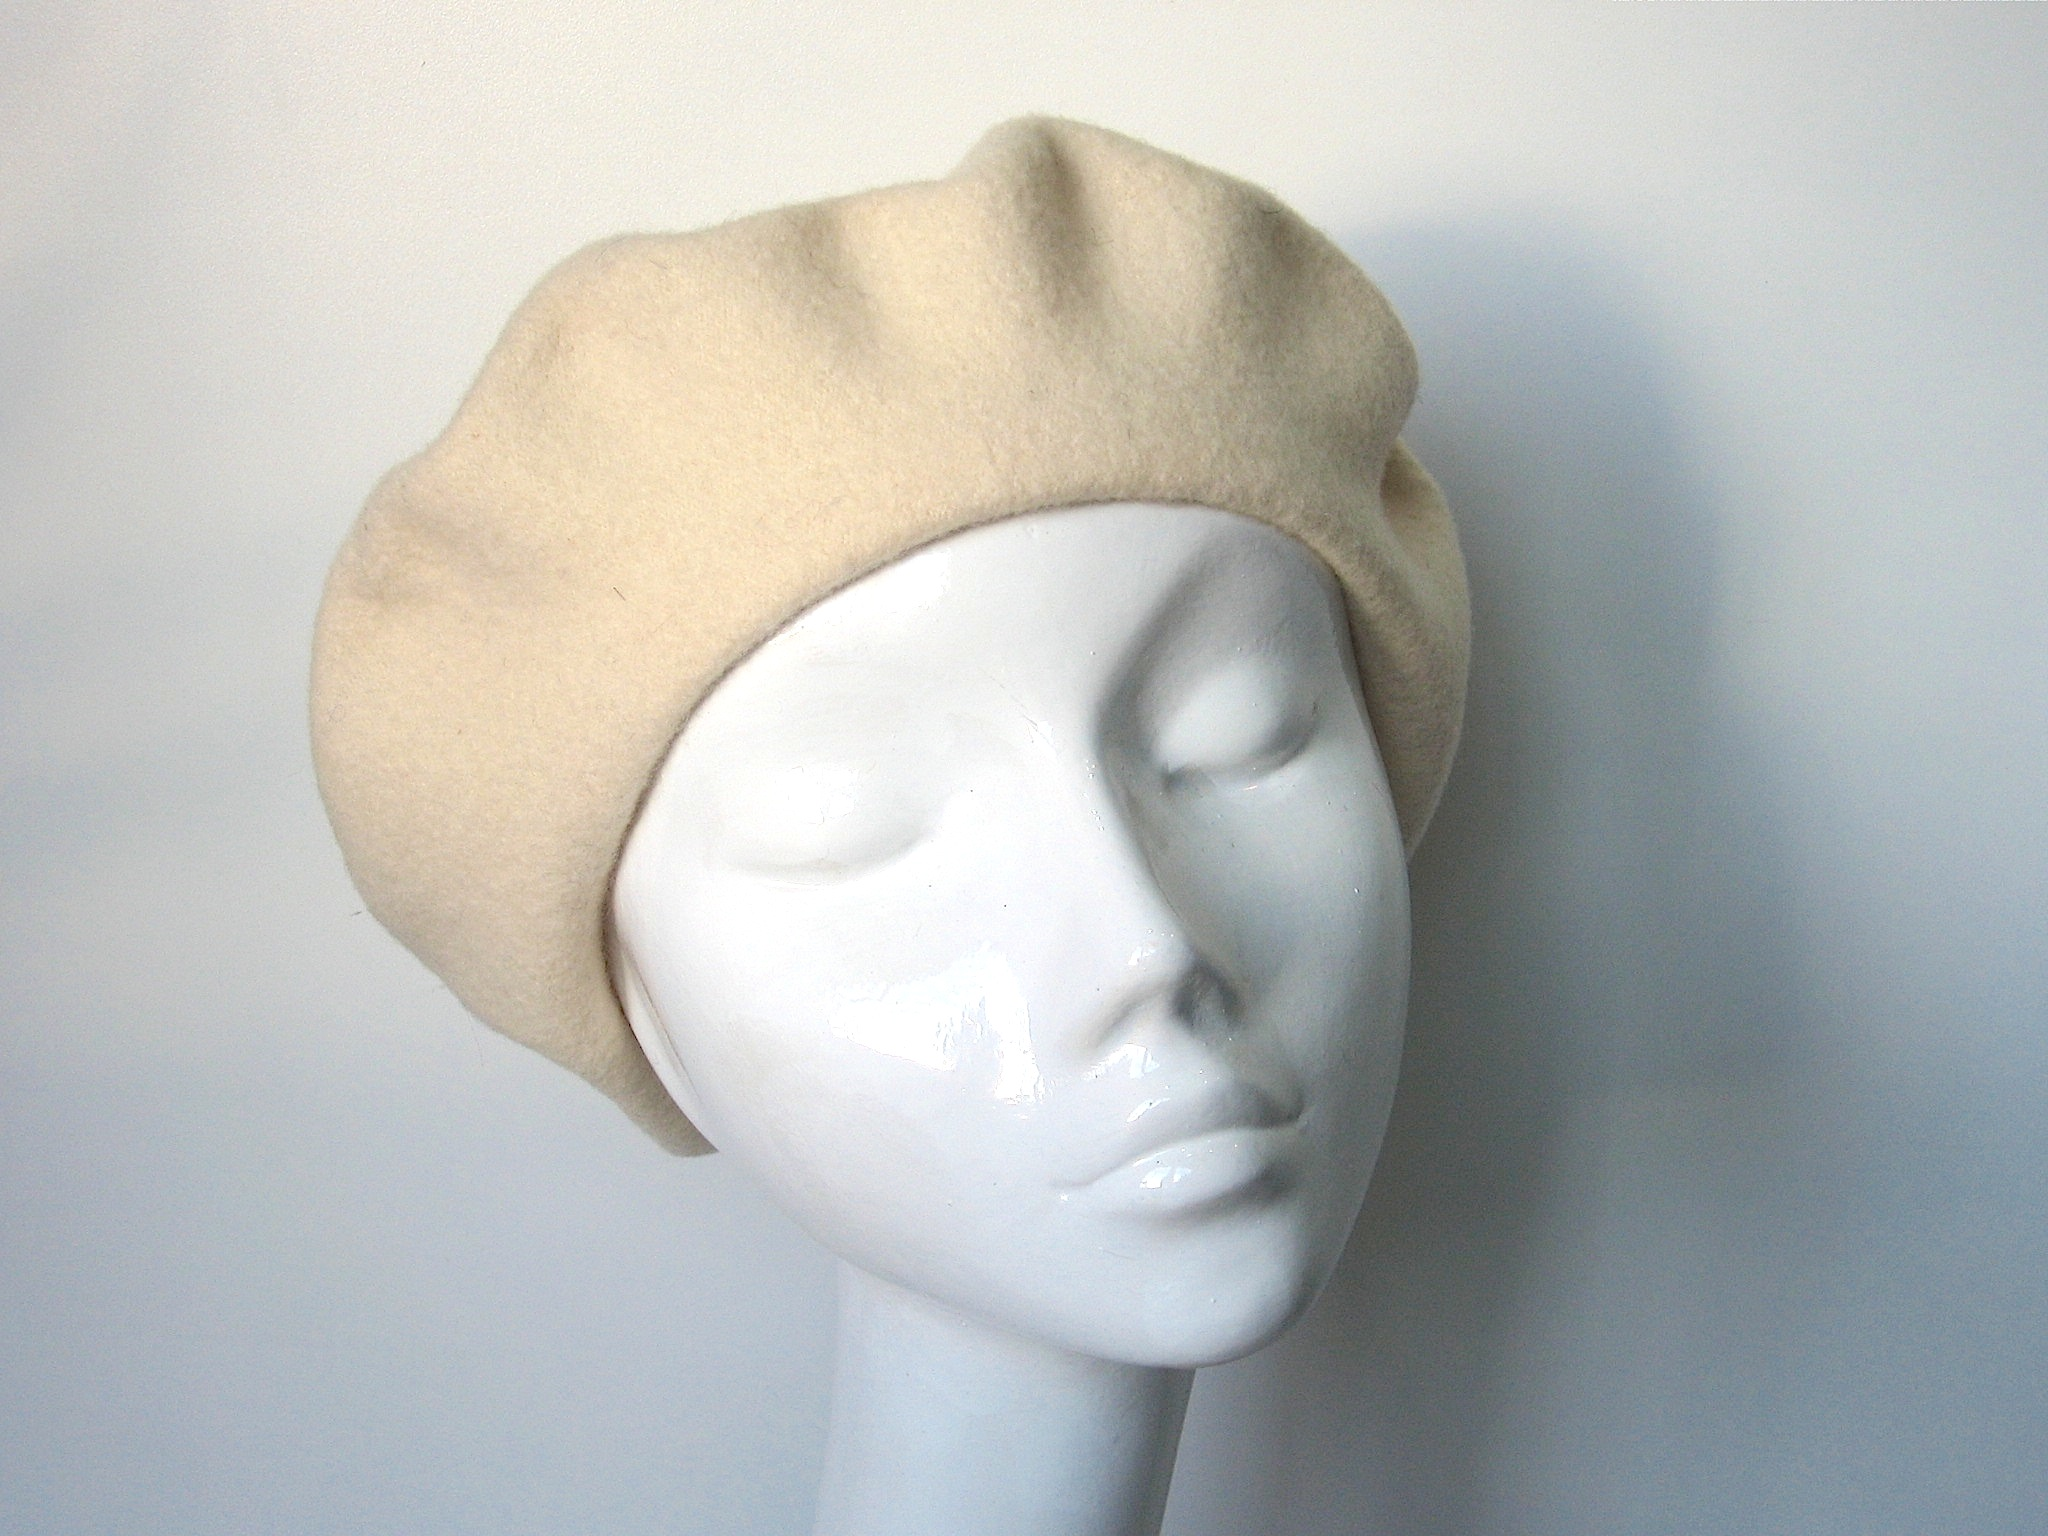 ce8563f7ac76f Kangol Cream Wool Beret. Sale! IMG 4669. IMG 4670 IMG 4671. Cream beret by  Kangol. 100% pure virgin wool. Made in Great Britain.